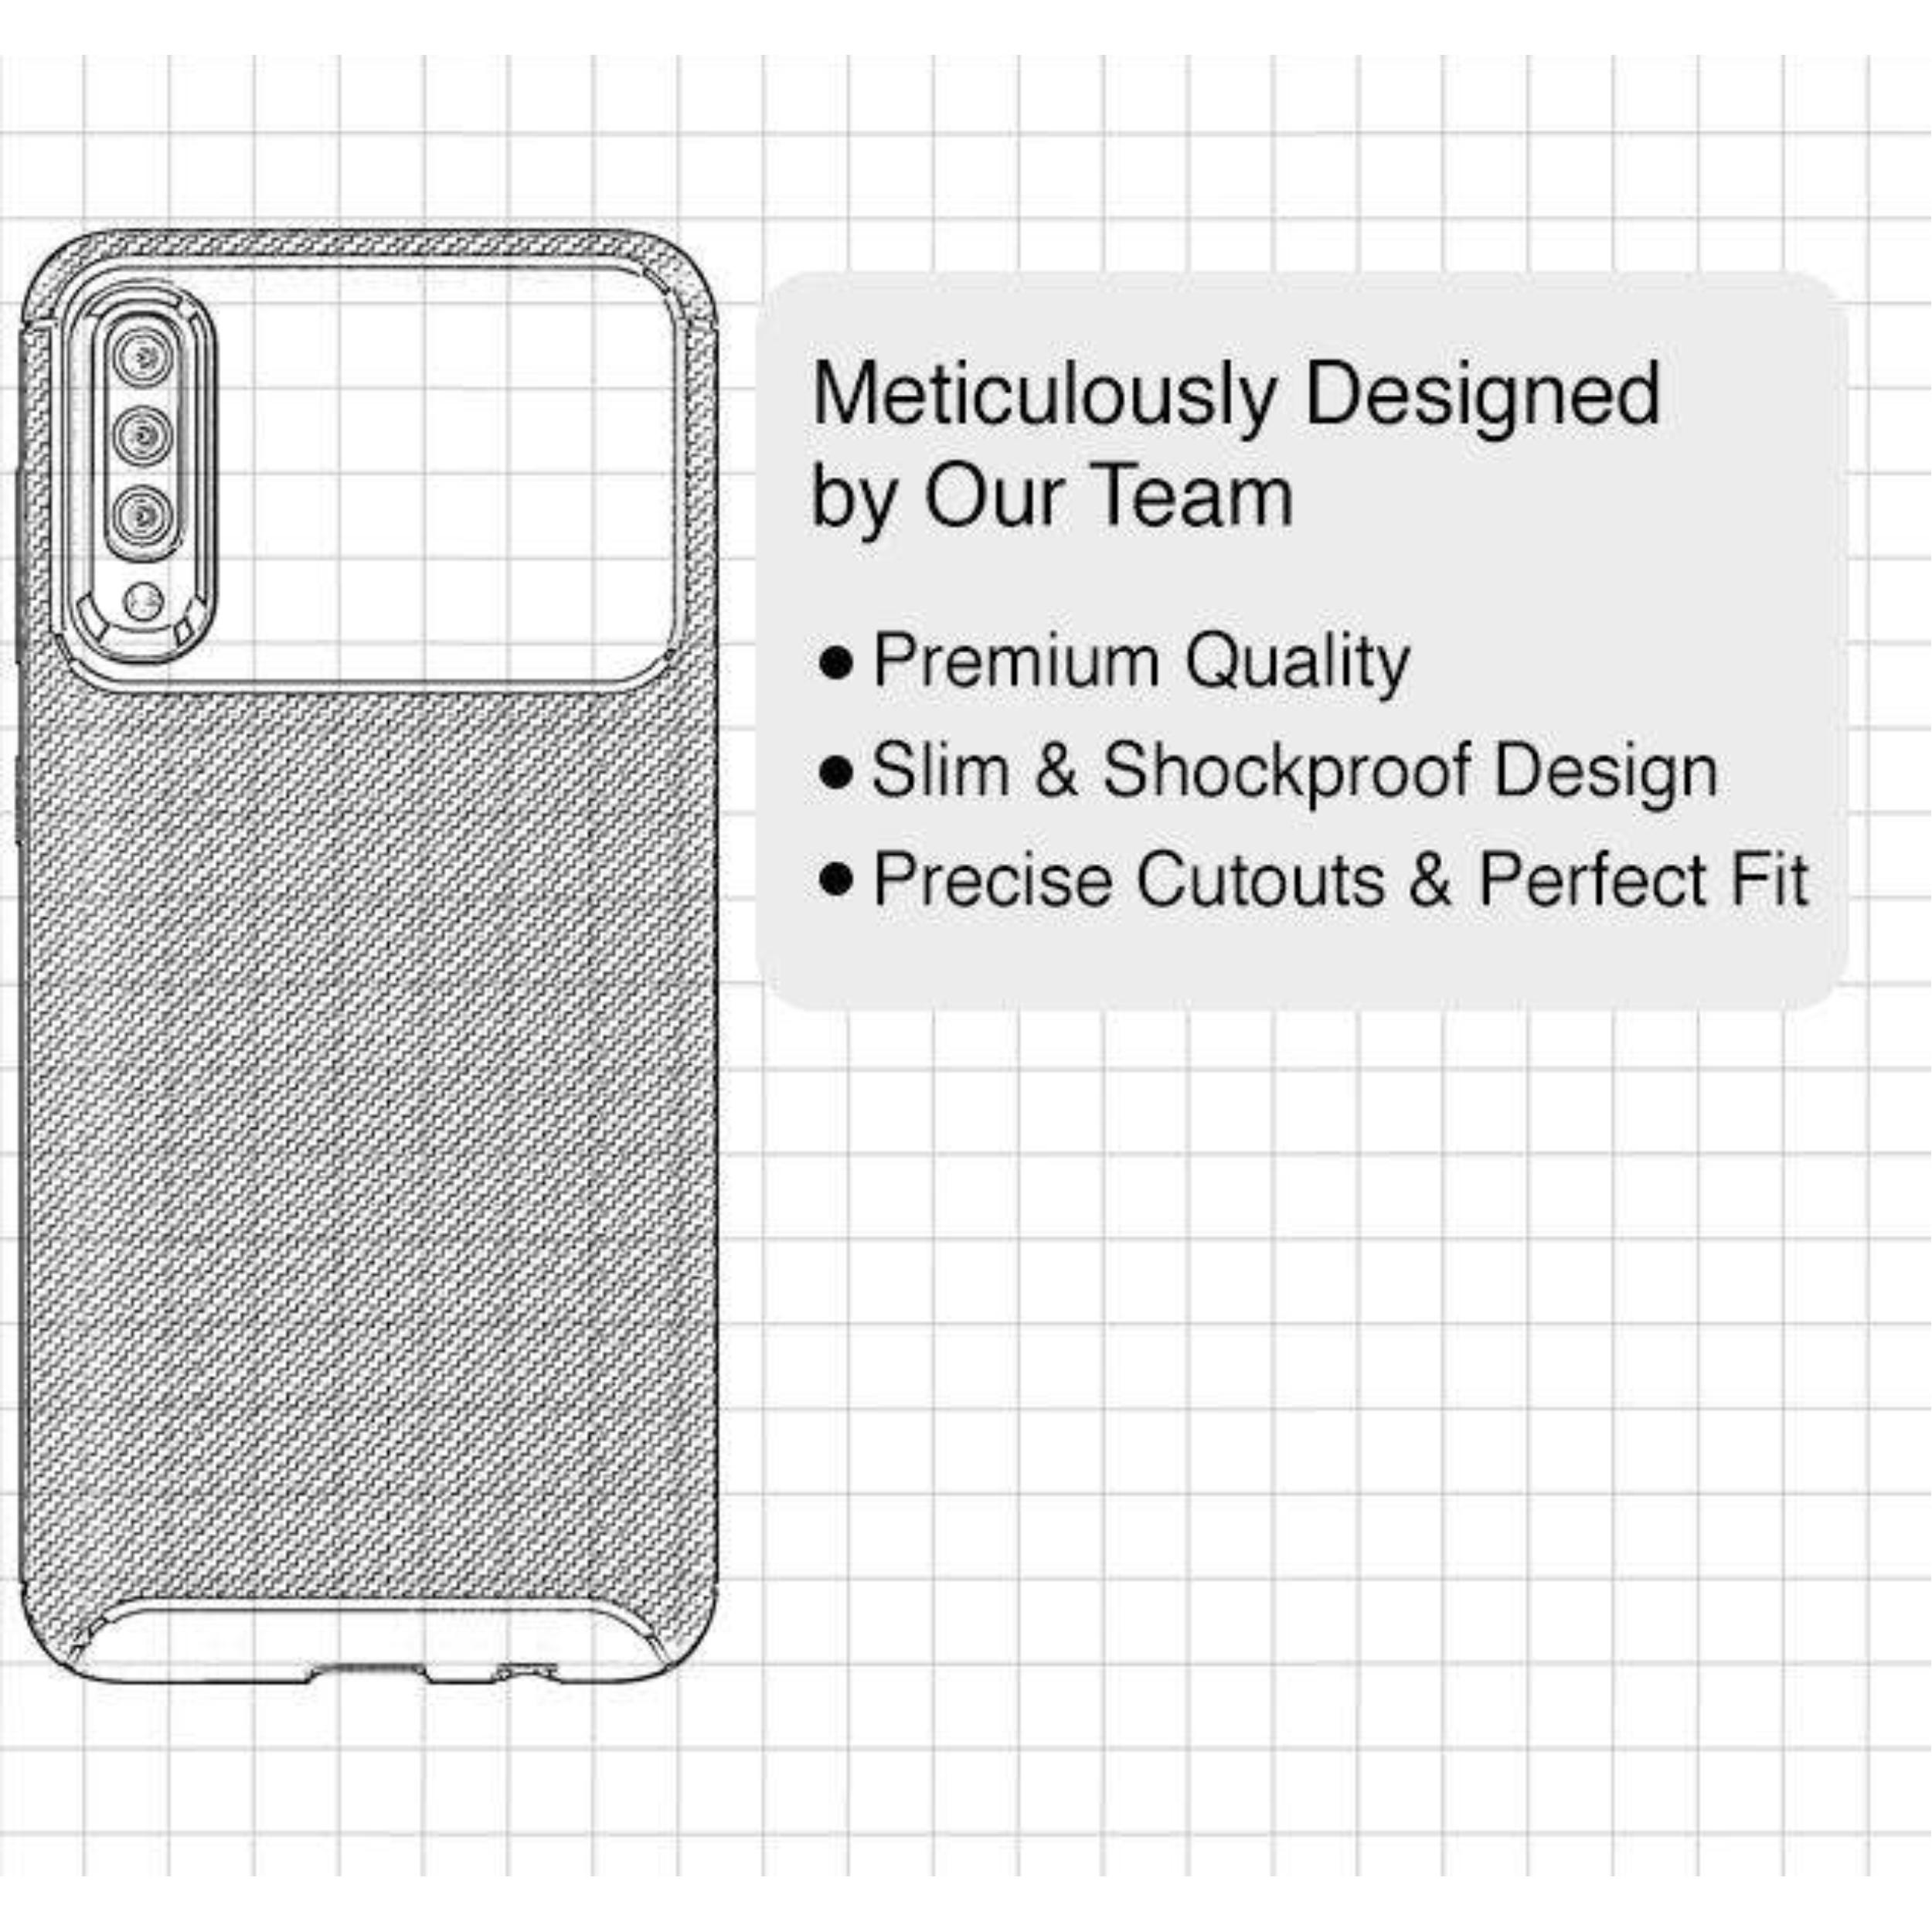 کاور لاین کینگ مدل A21 مناسب برای گوشی موبایل سامسونگ Galaxy A50/A50s/A30s thumb 2 9